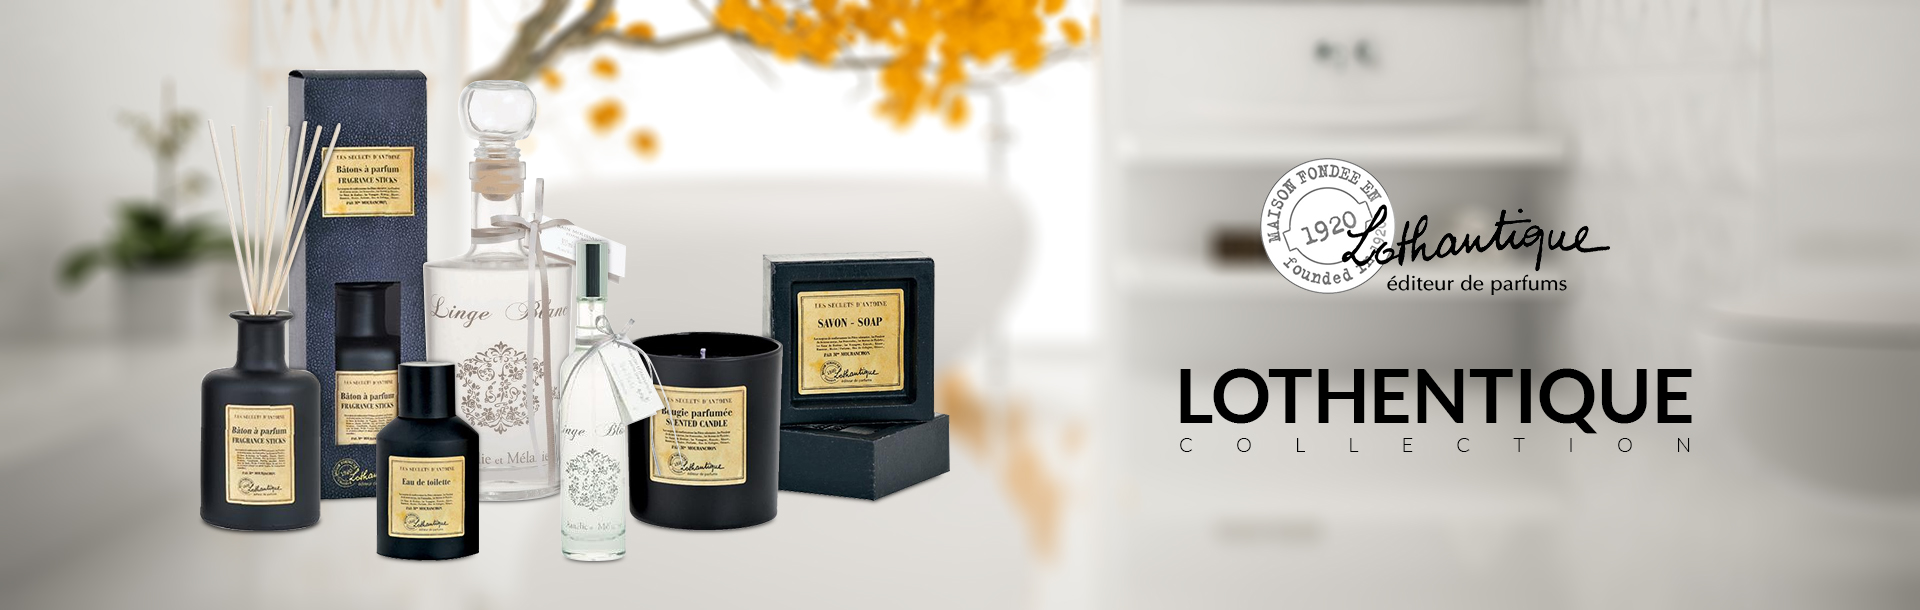 Lothantique Collection